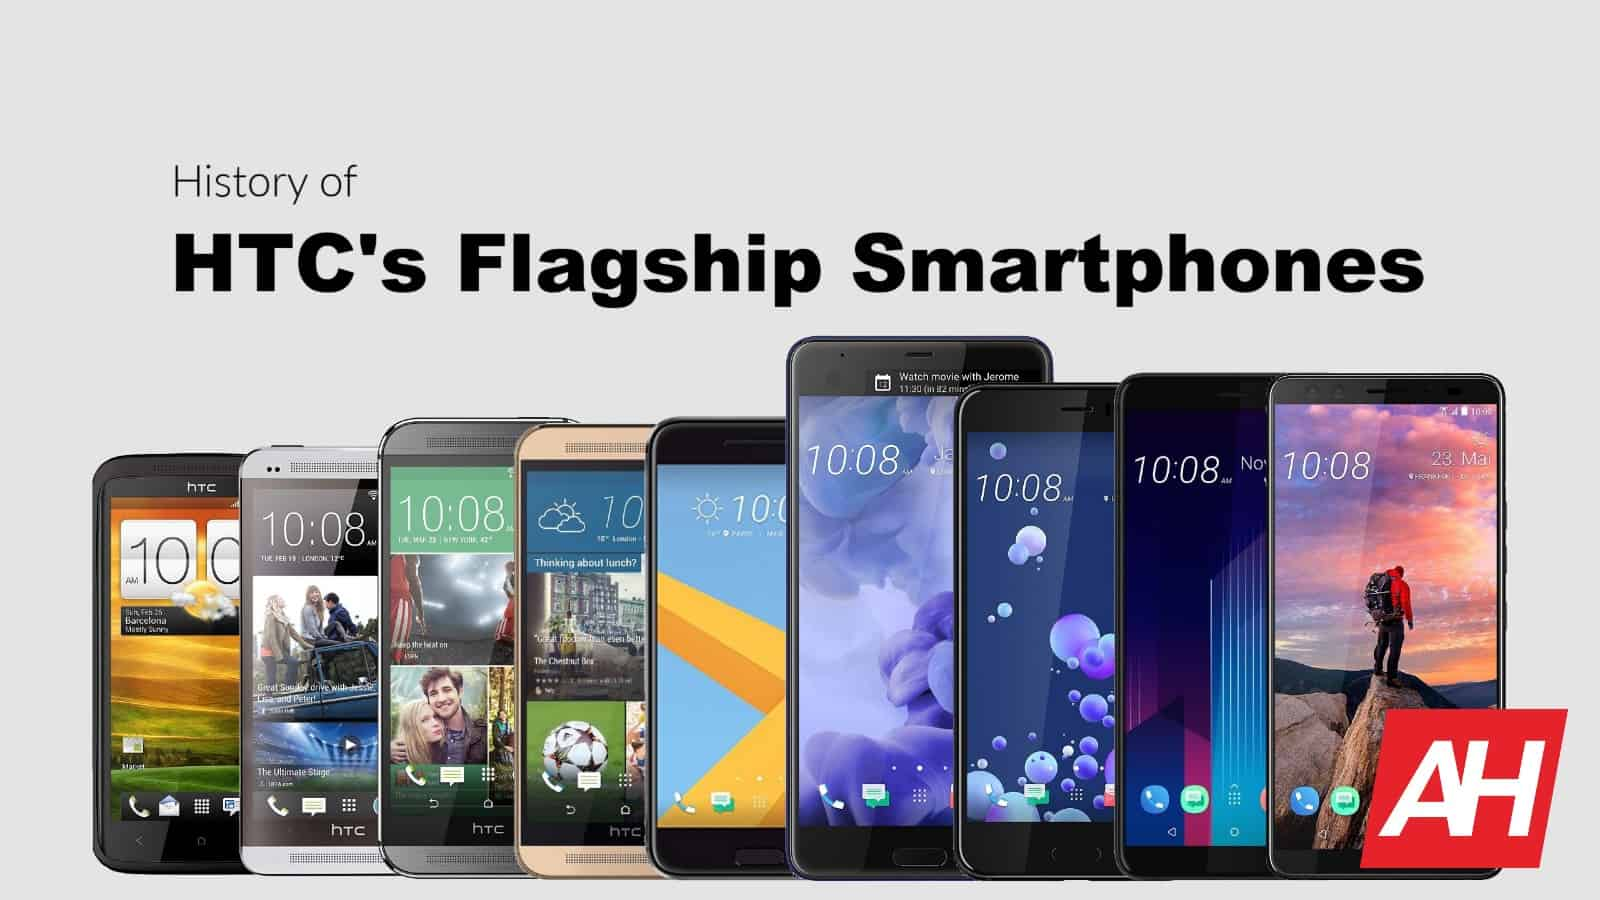 AH HTC flagship smartphone history May 2019